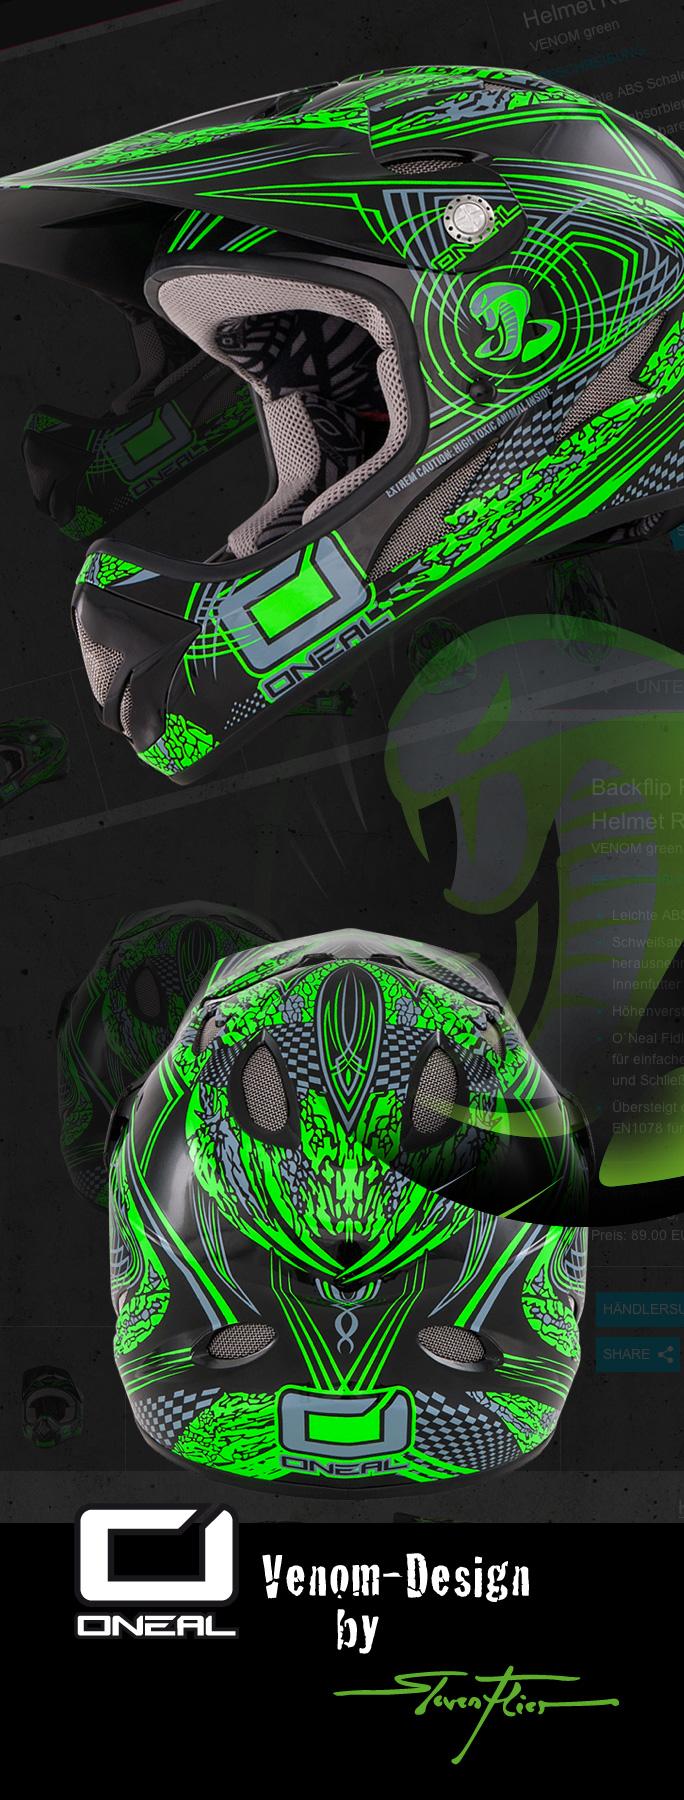 O'Neal Europe, 2Wheel-Distribution, Helm, Helmet, MTB, Downhill, Fury, Biohazard, Airtech 2, Oozy, Maori, Design, Steven Flier